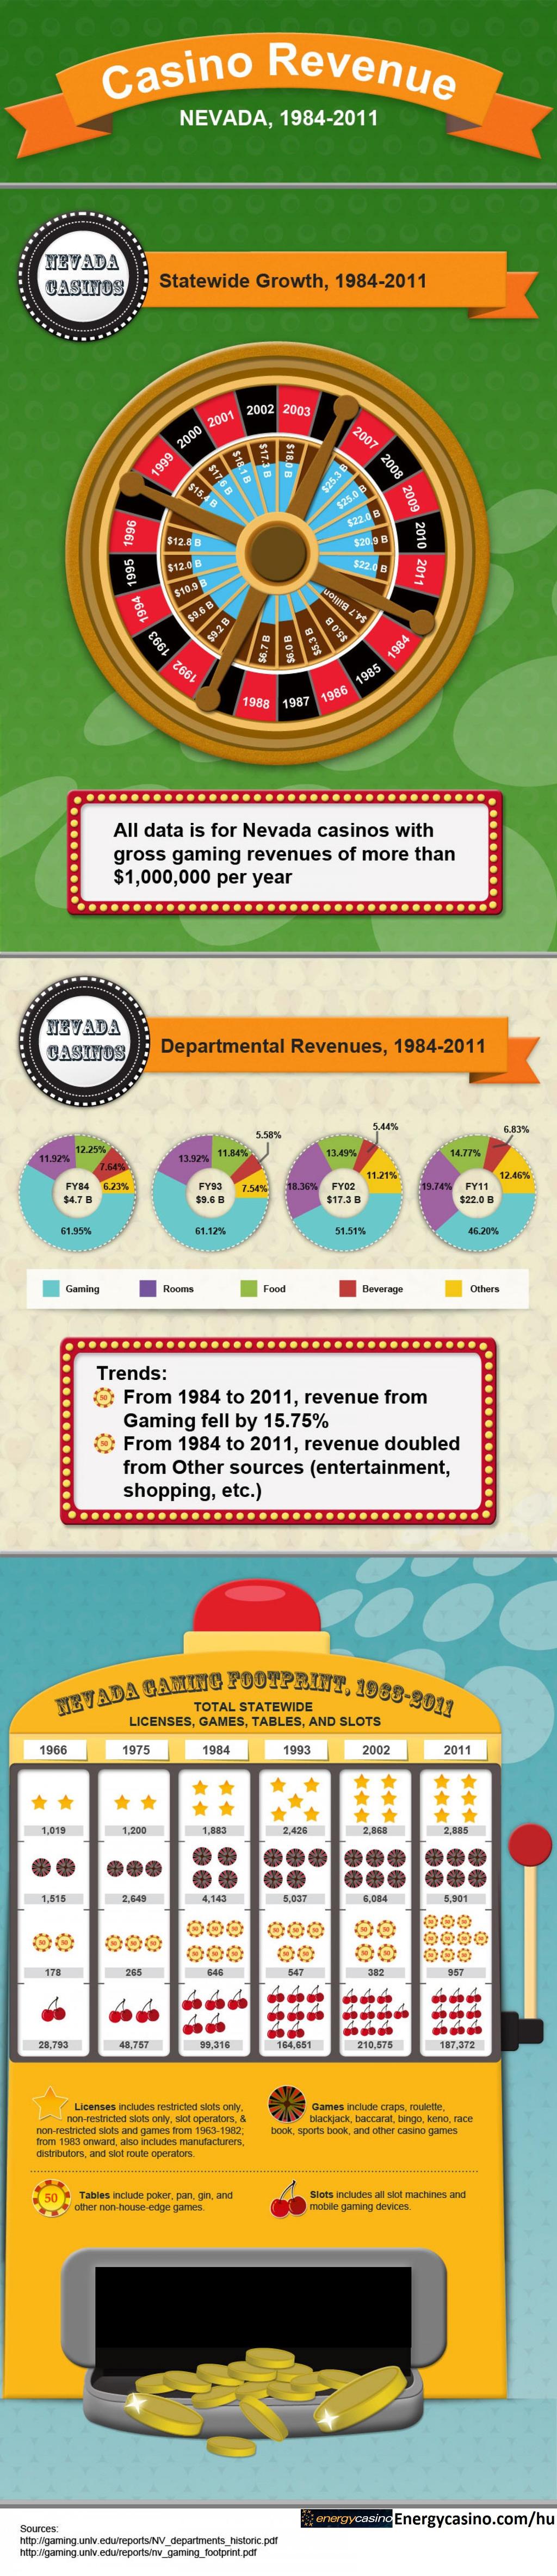 Revenue from casino silver reef casino bellingham washington